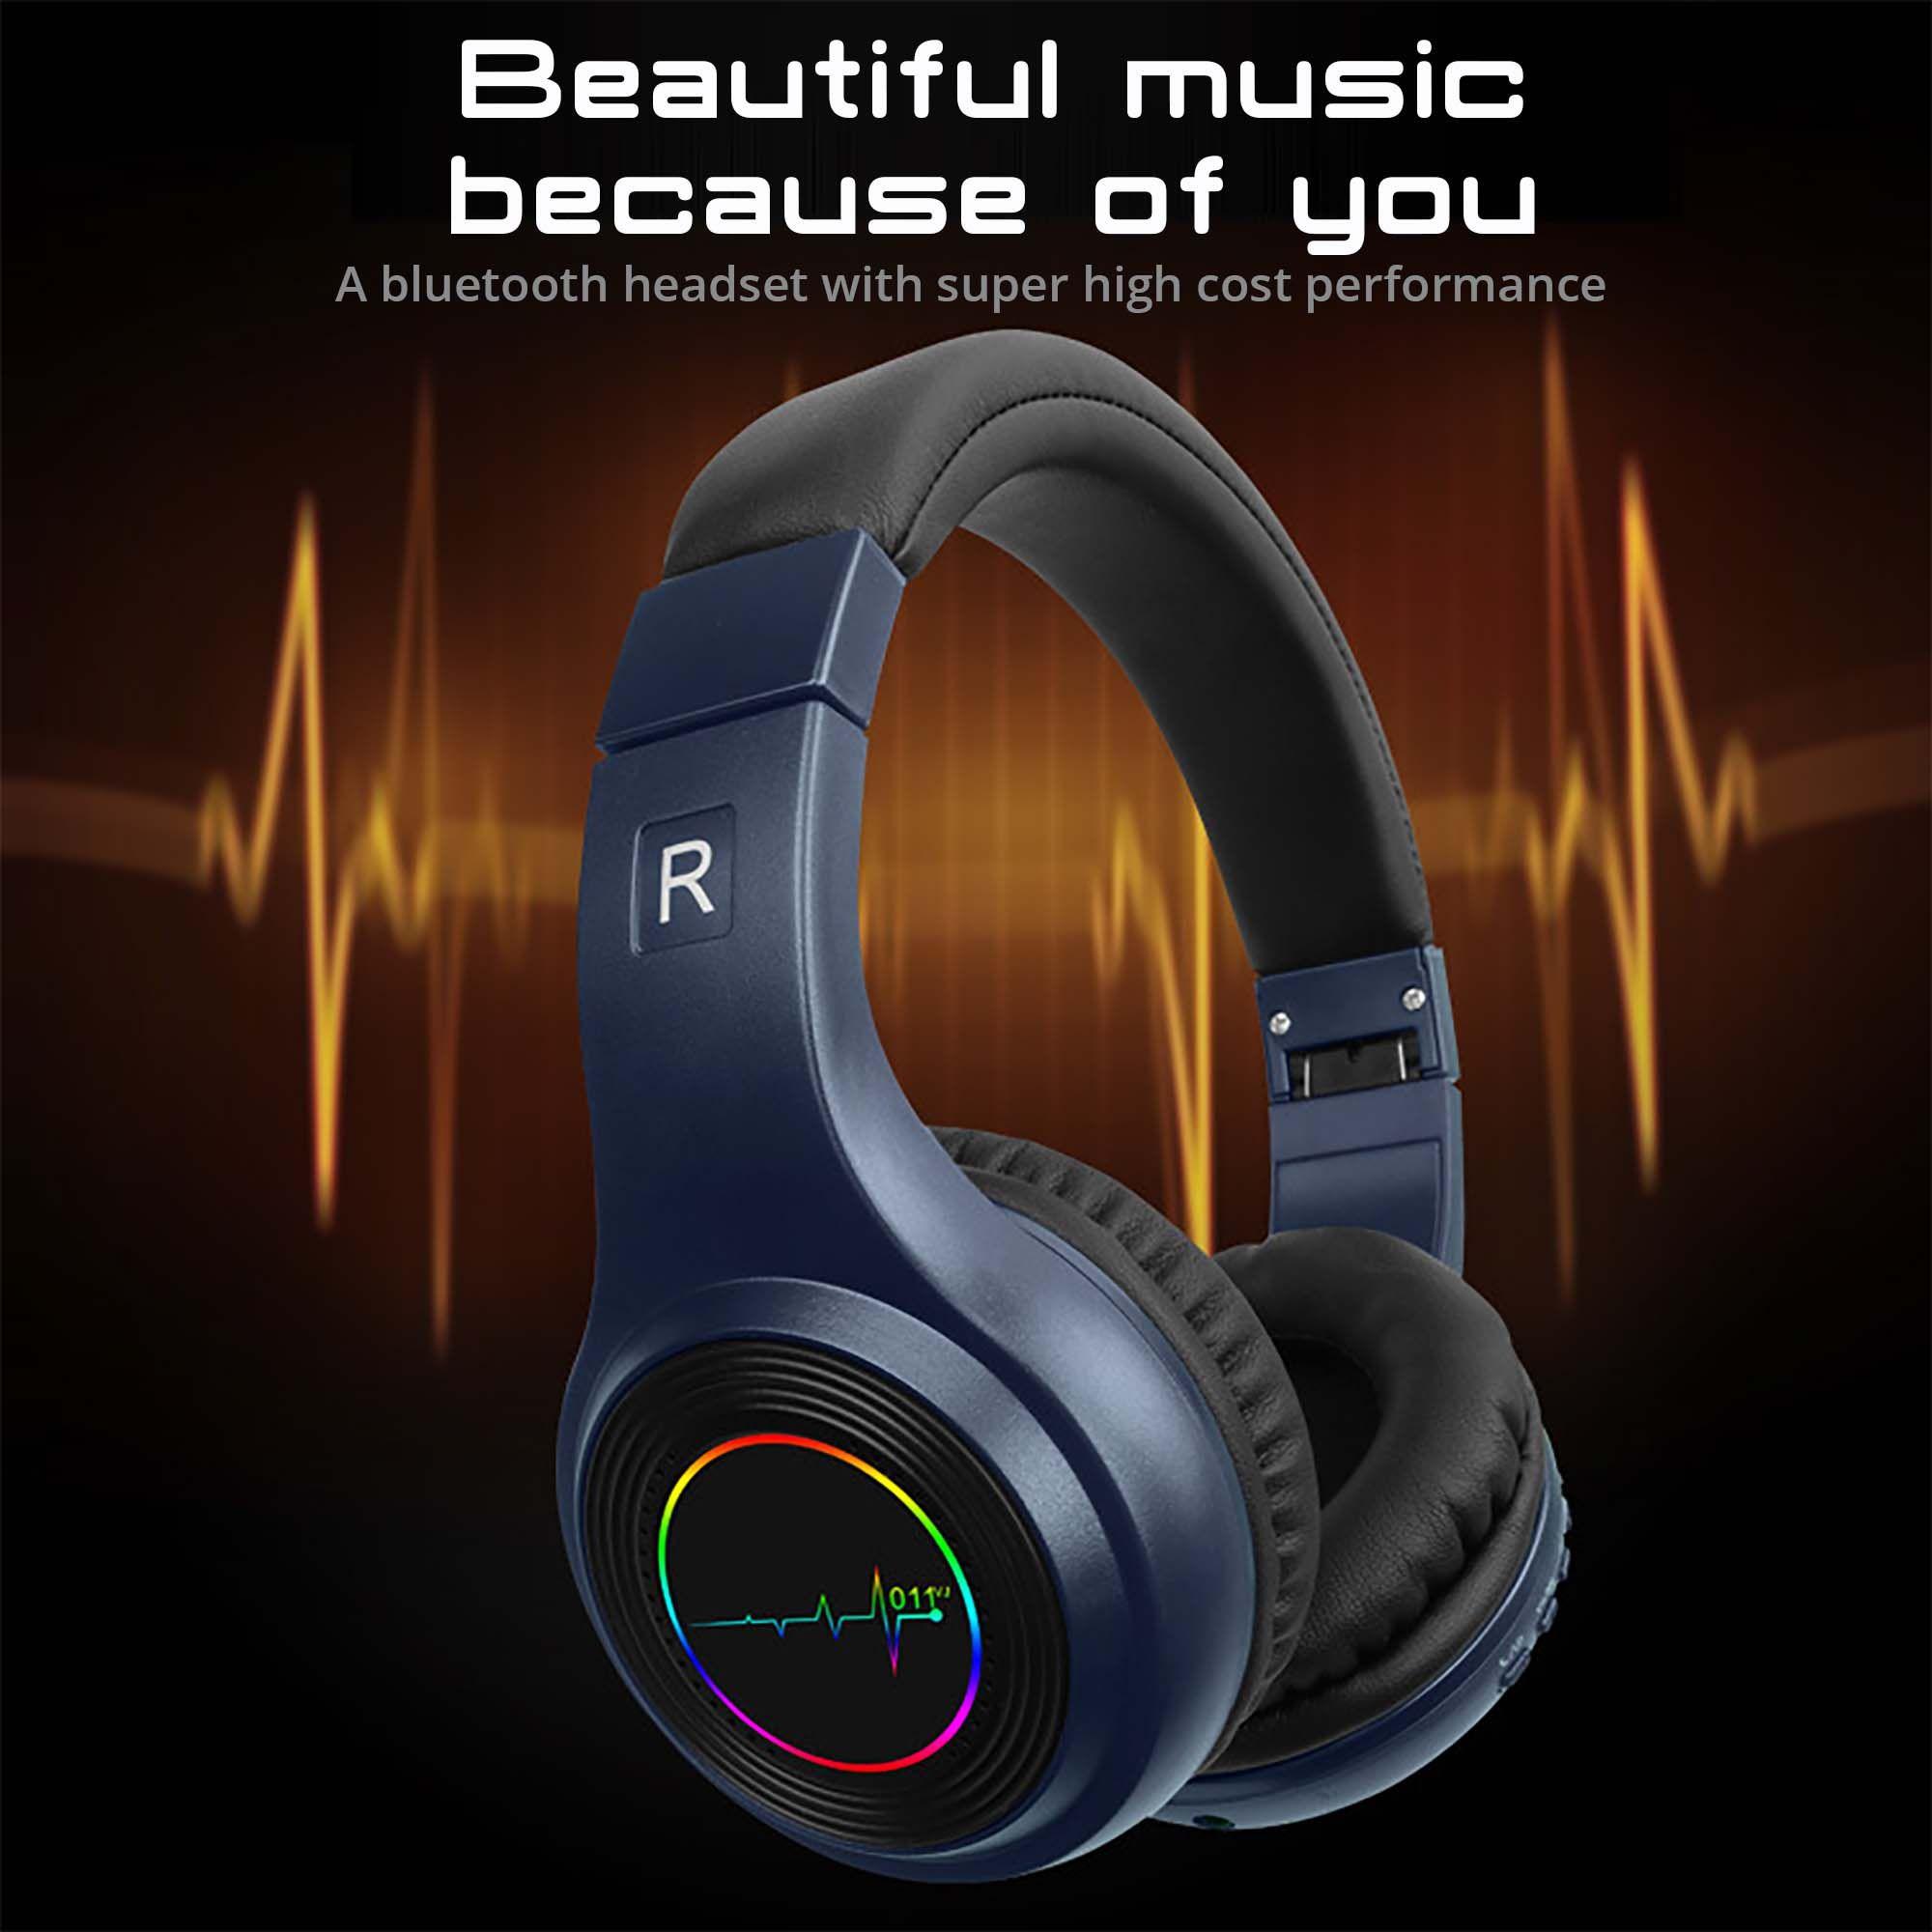 VJ011 بلوتوث الحقيقية لاسلكية سماعات الرأس استوديو TWS خلال سماعات الأذن الألعاب مصمم cuffie إلغاء الضوضاء سماعة DJ عقال